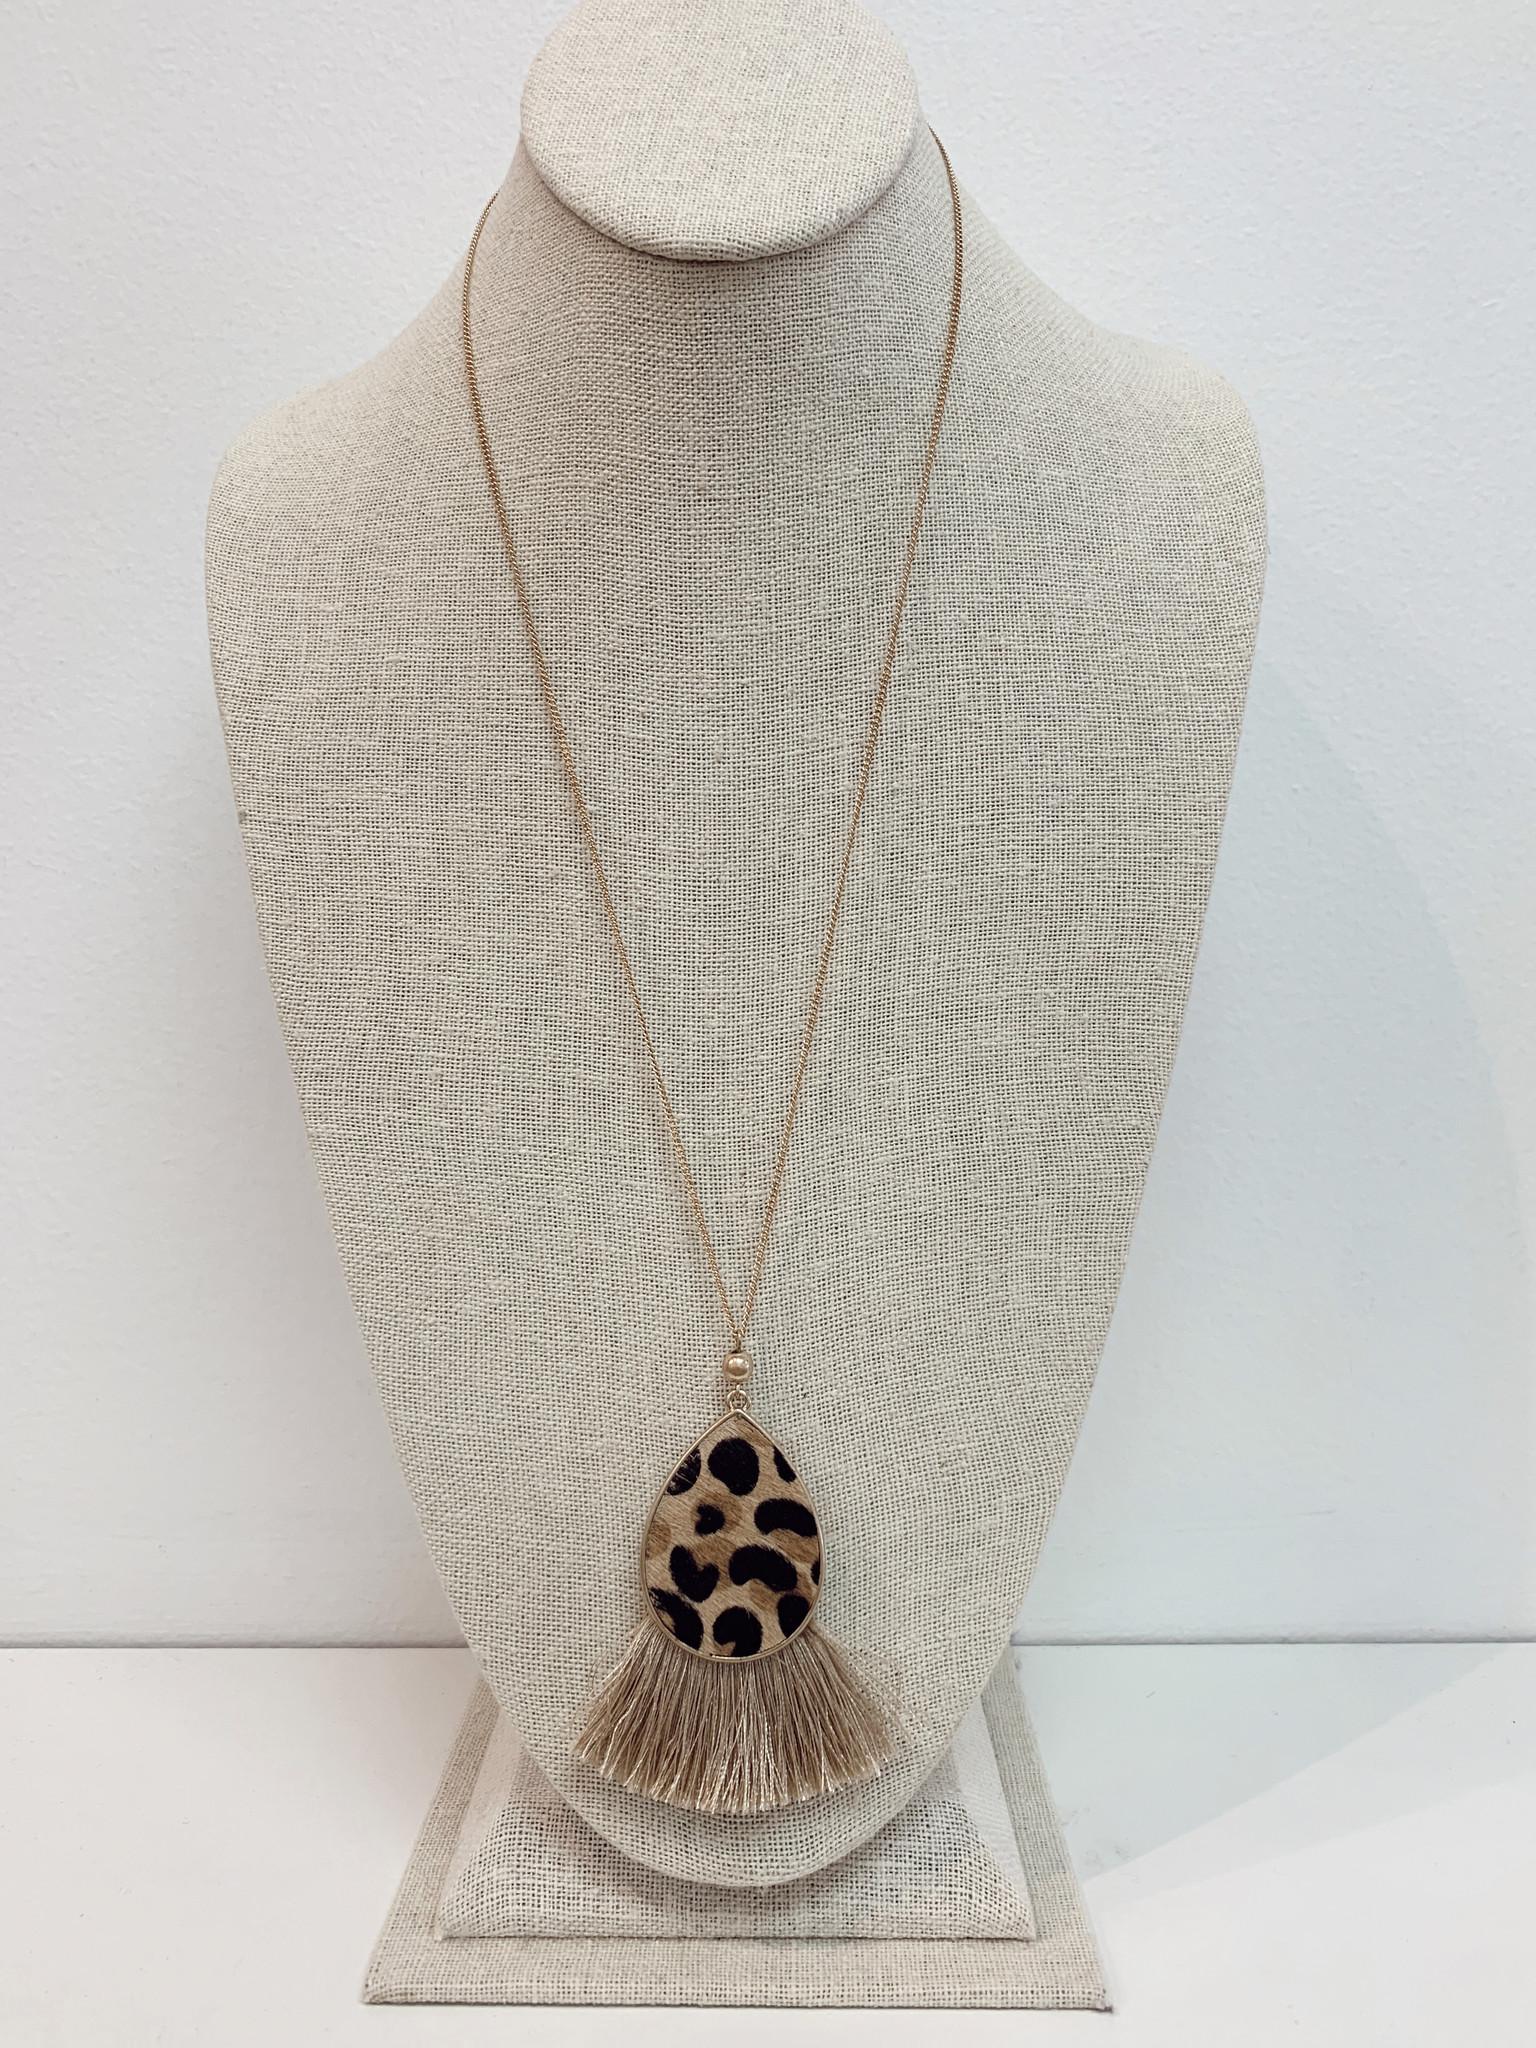 JA Teardrop Tassel Necklace 7084